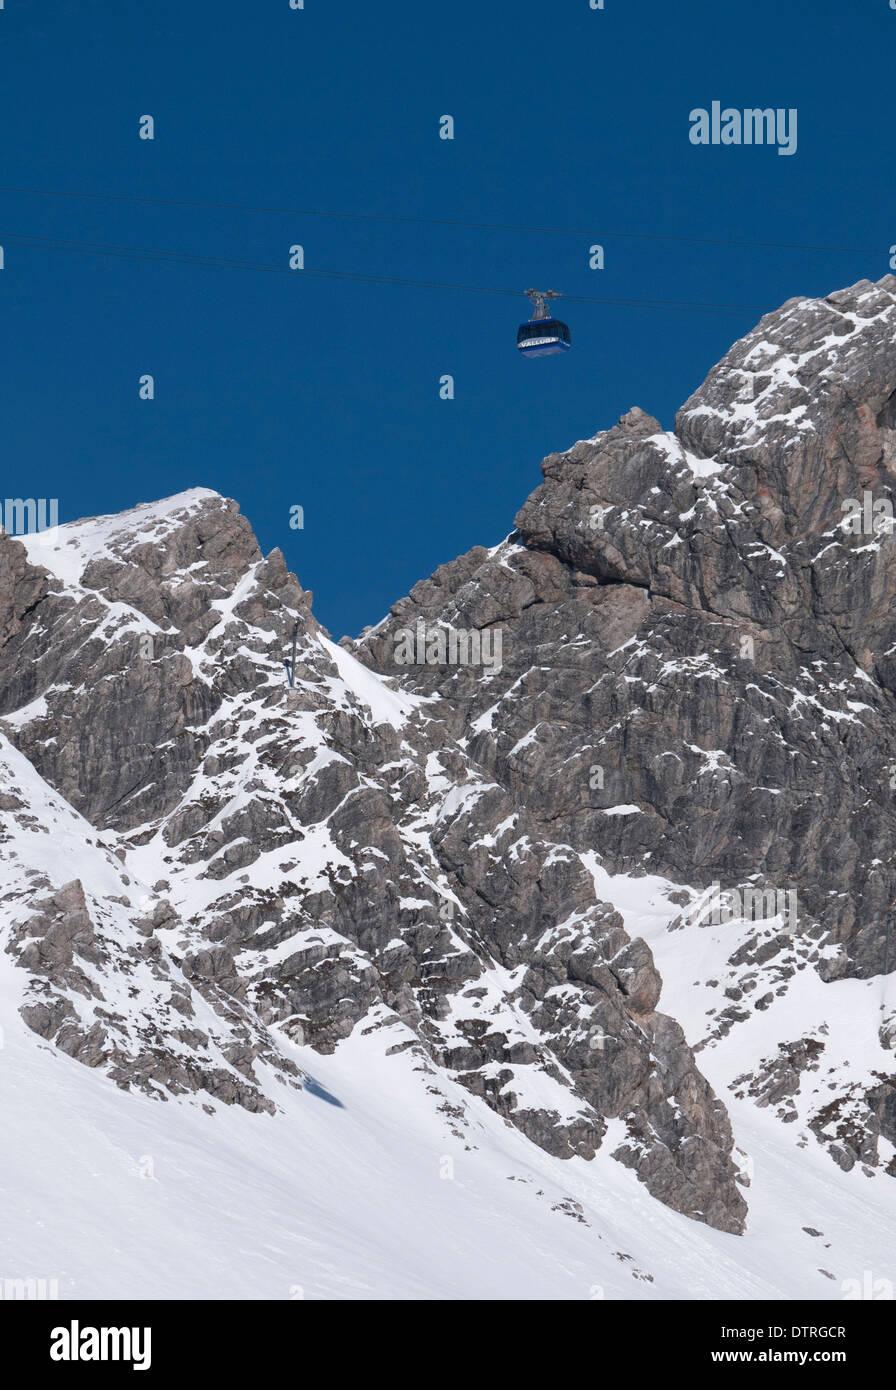 Valluga Bahn Seilbahn im Skigebiet St. Anton am Arlberg, Österreich Stockbild